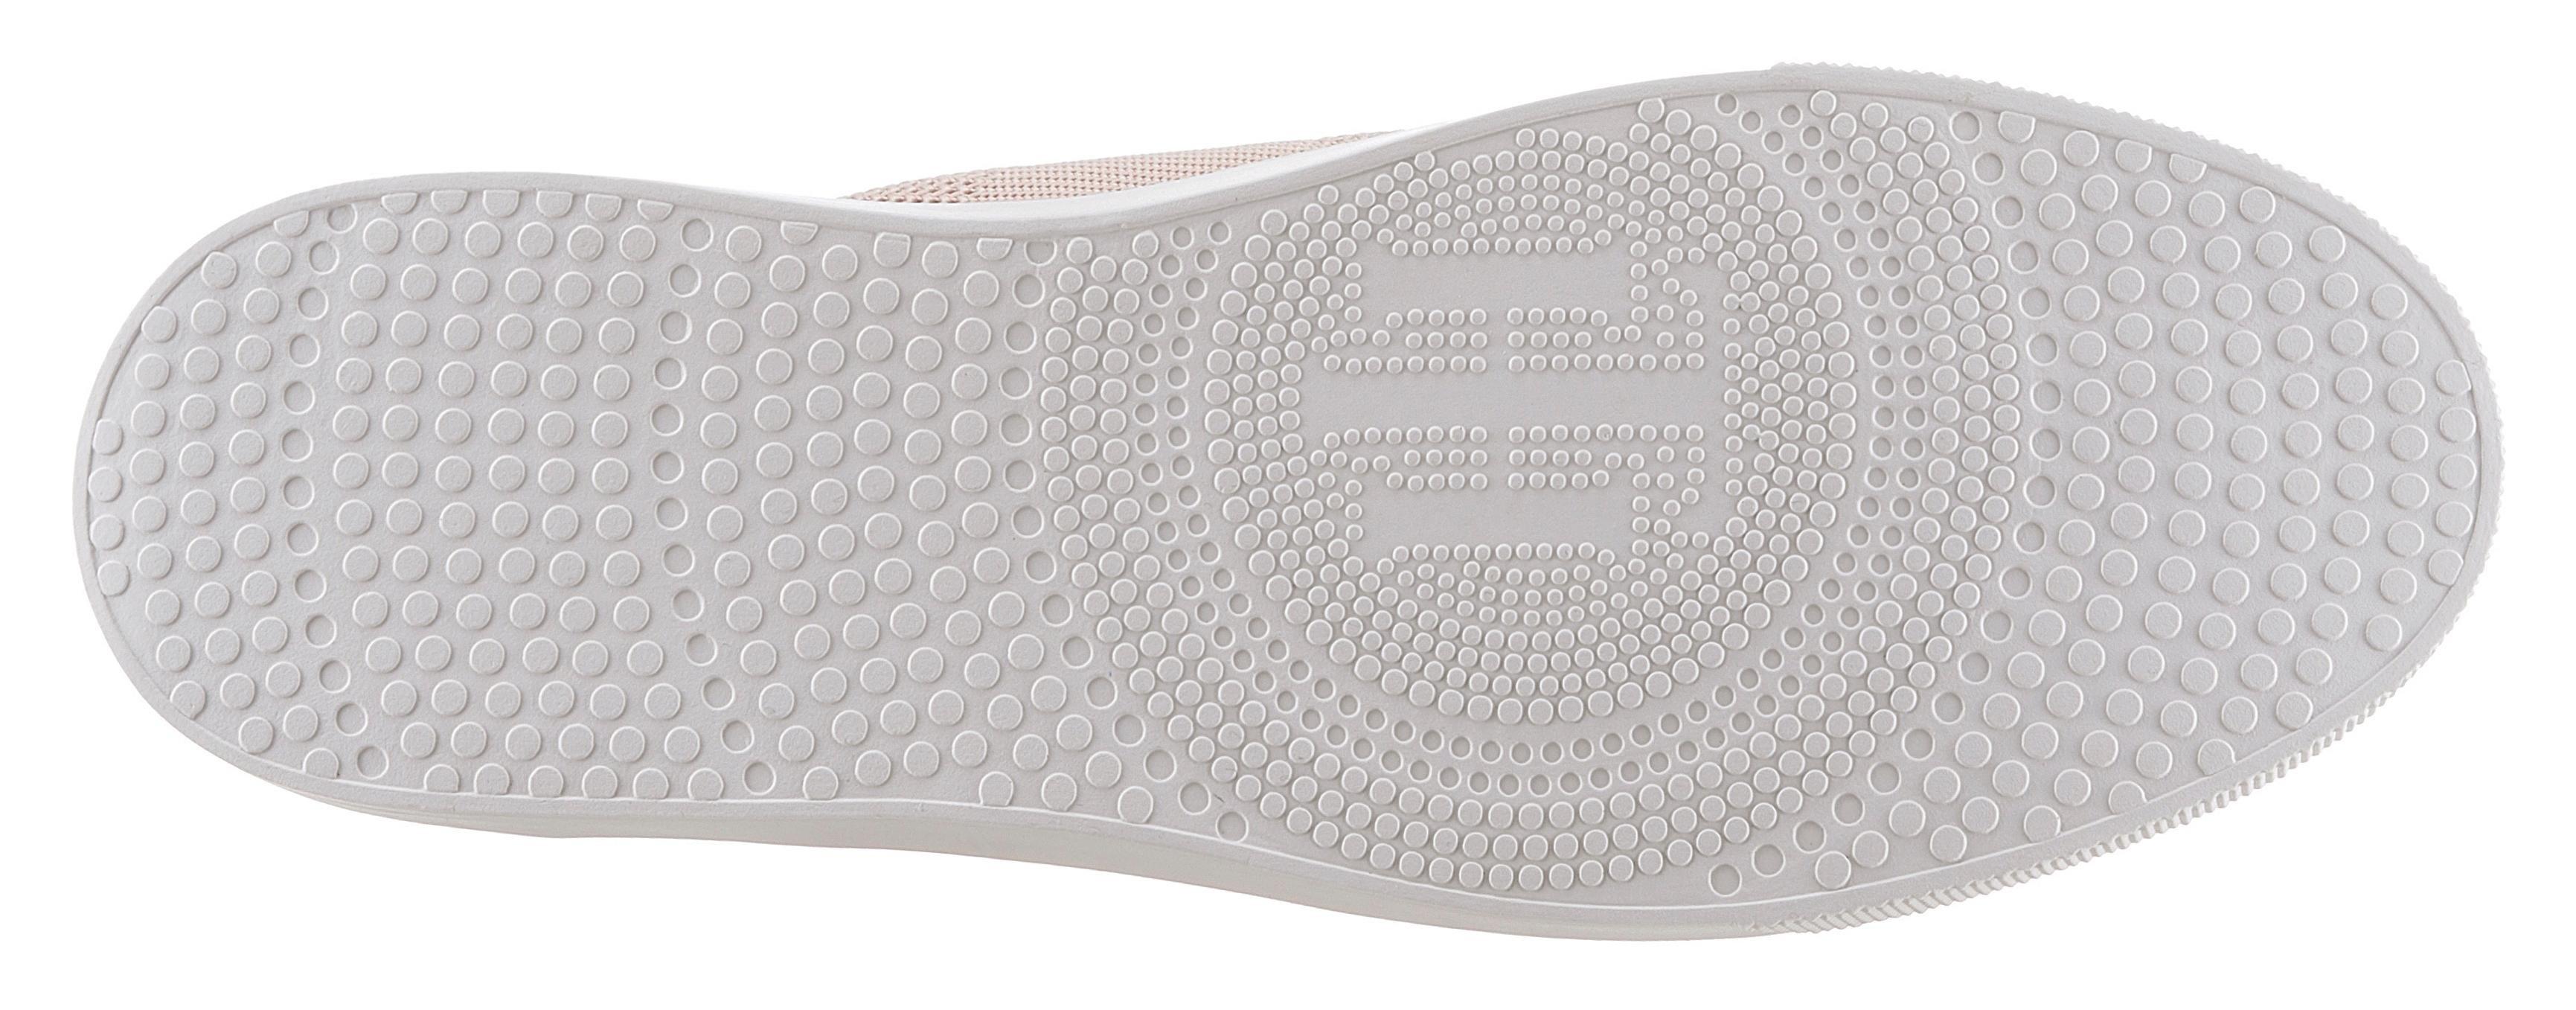 TOMMY HILFIGER slip-on sneakers »KNITTED TOMMY HILFIGER SNEAKER« online kopen op otto.nl